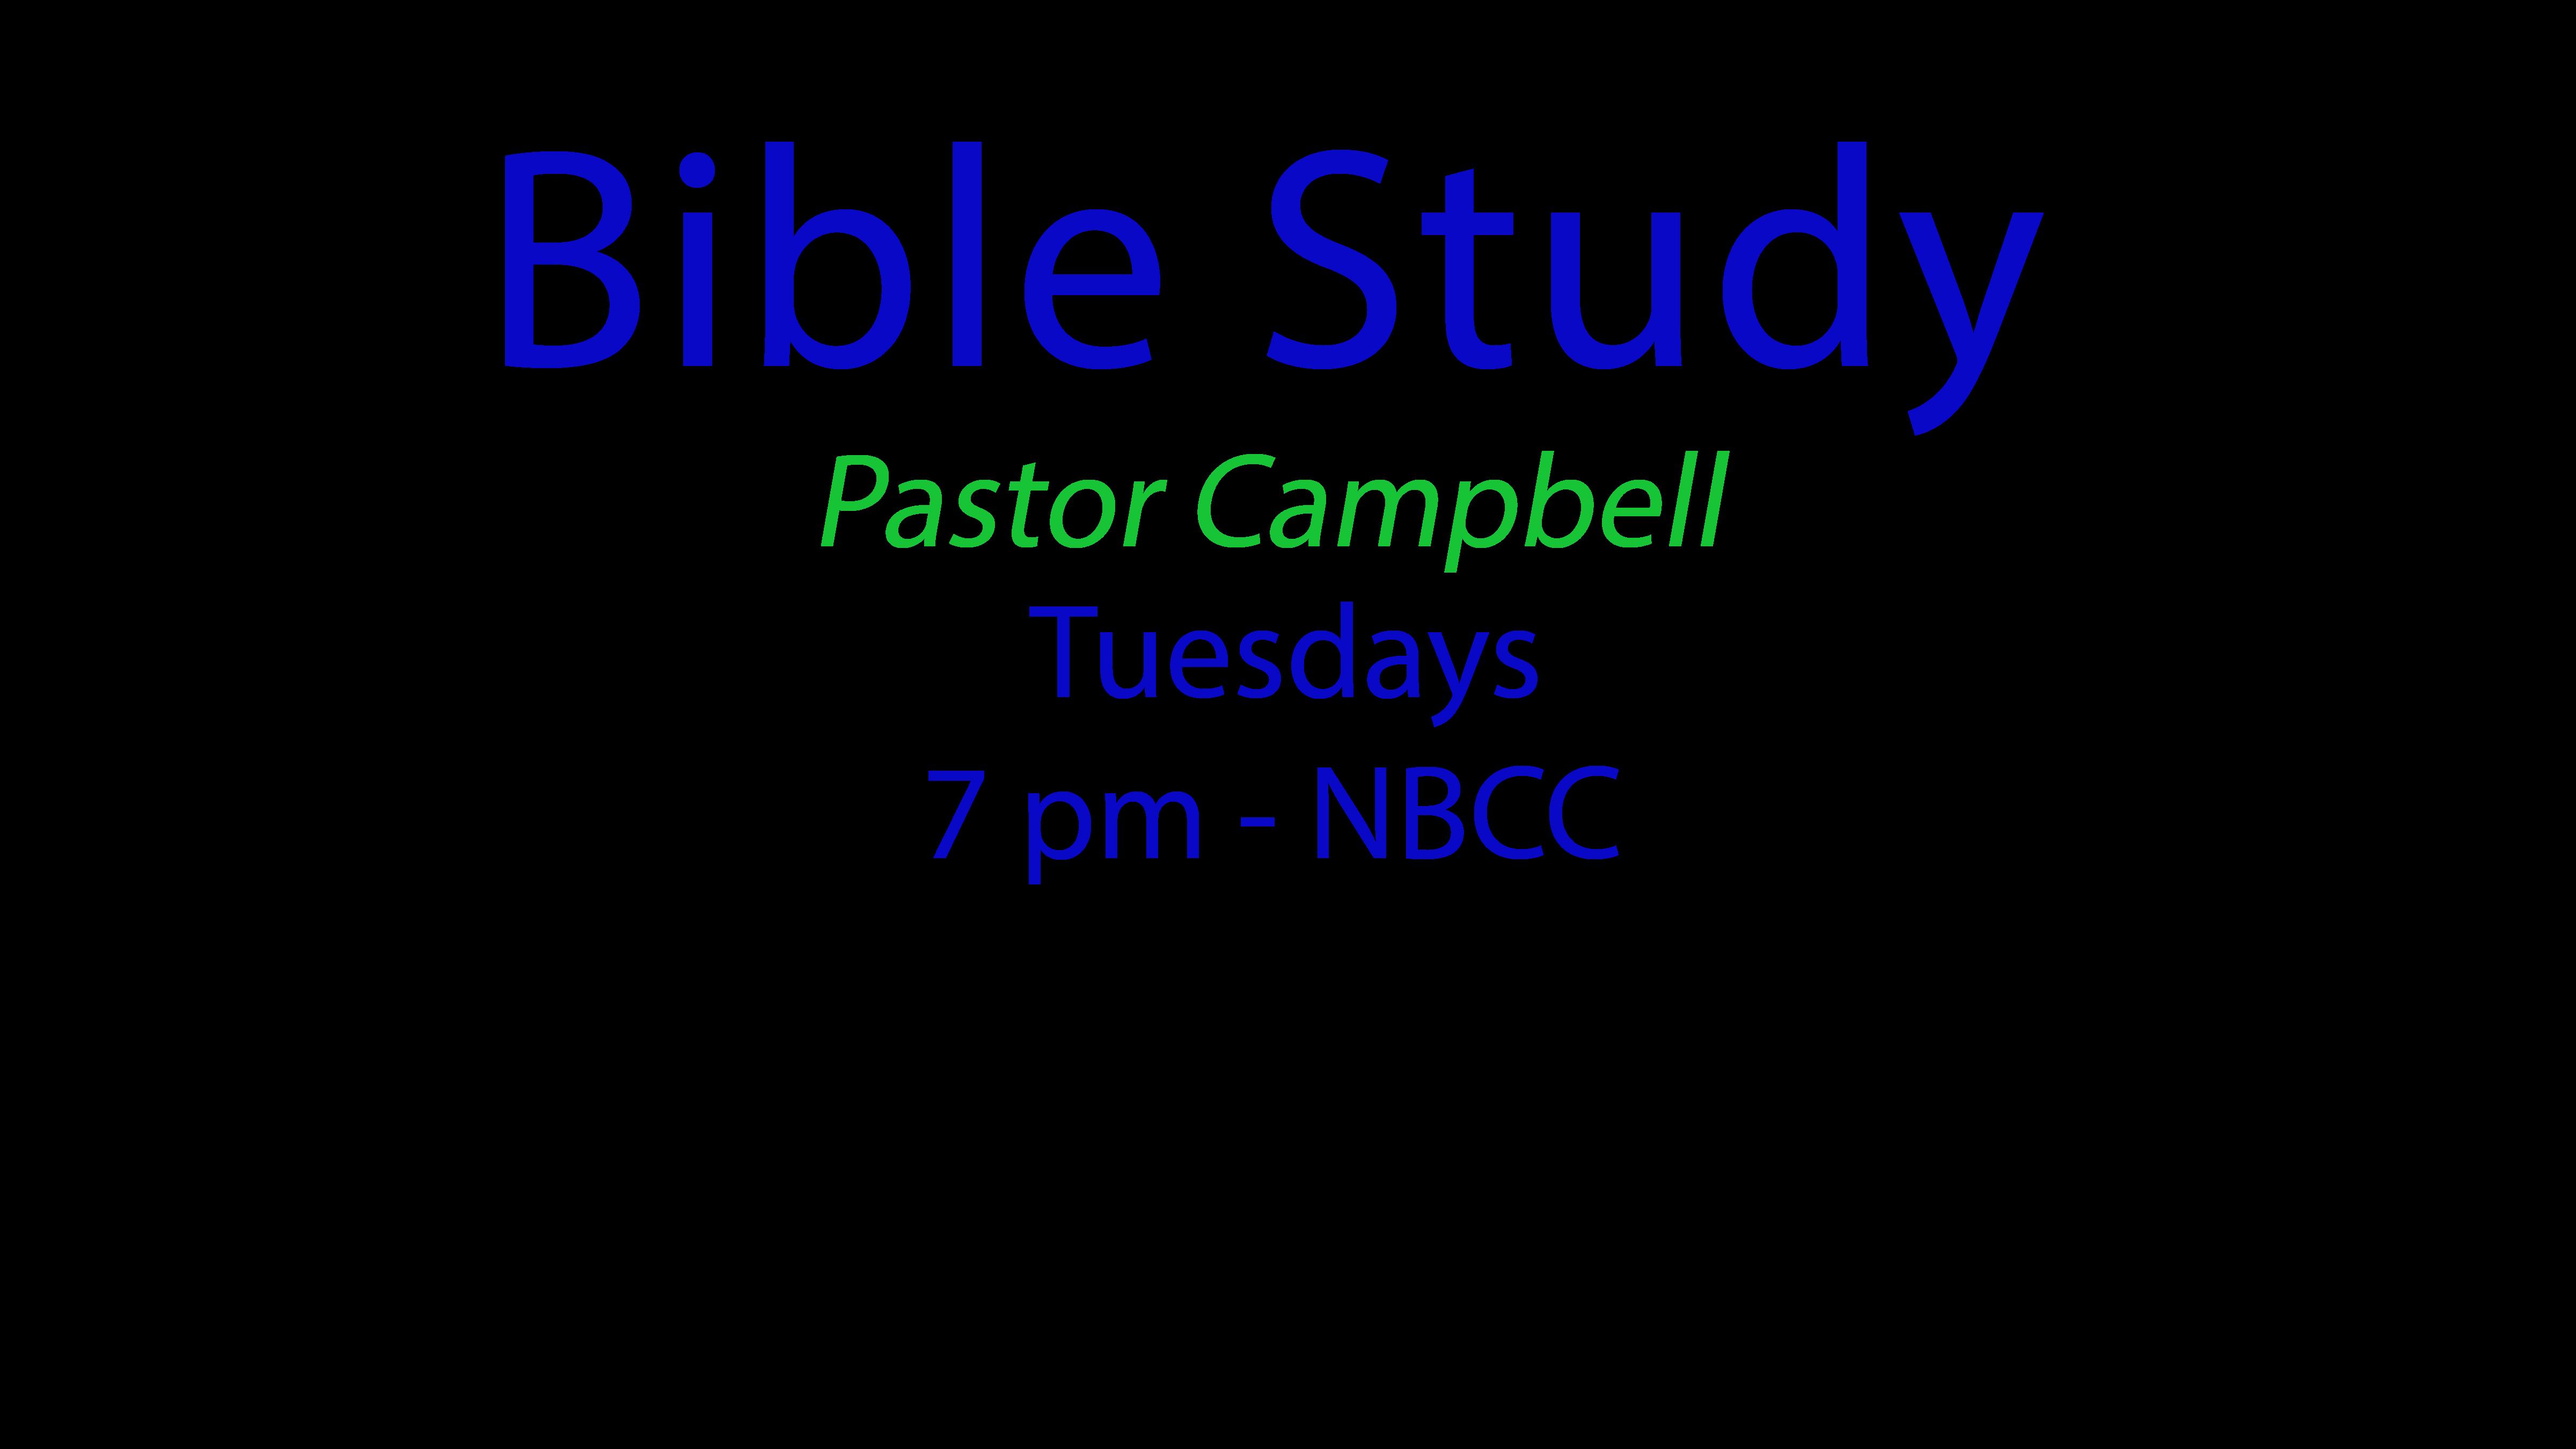 /Images/newbeginningschurch/site/images/groups/Bible_study.png